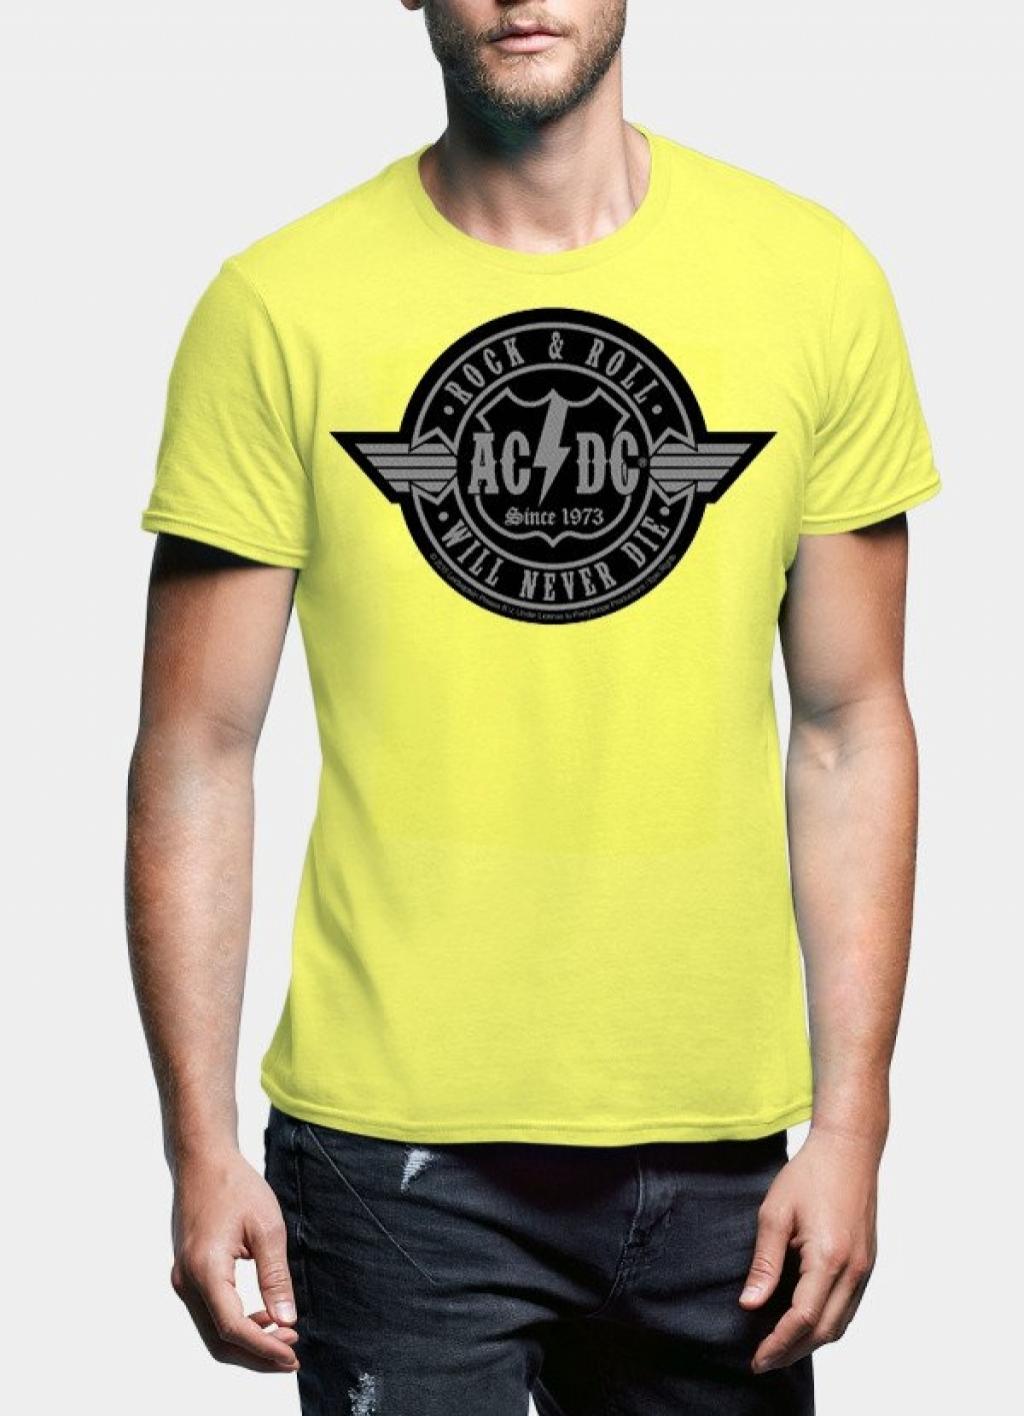 14964187690_ACDC_Back_In_Metal_Grey_Half_Sleeve_Men_T-Shirt-yellow.jpg